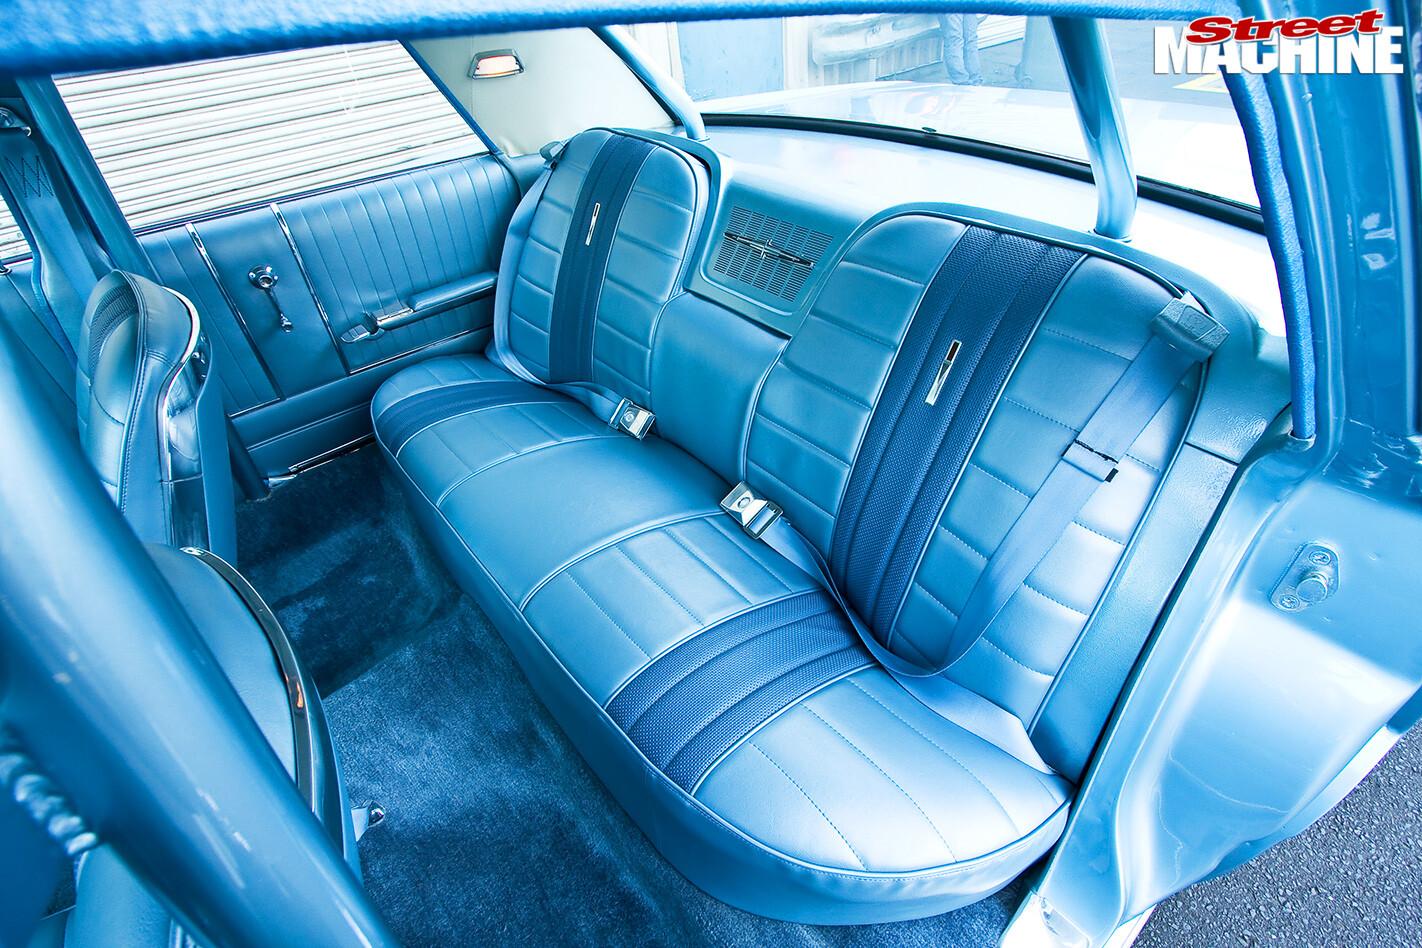 Ford -galaxie -interior -rear